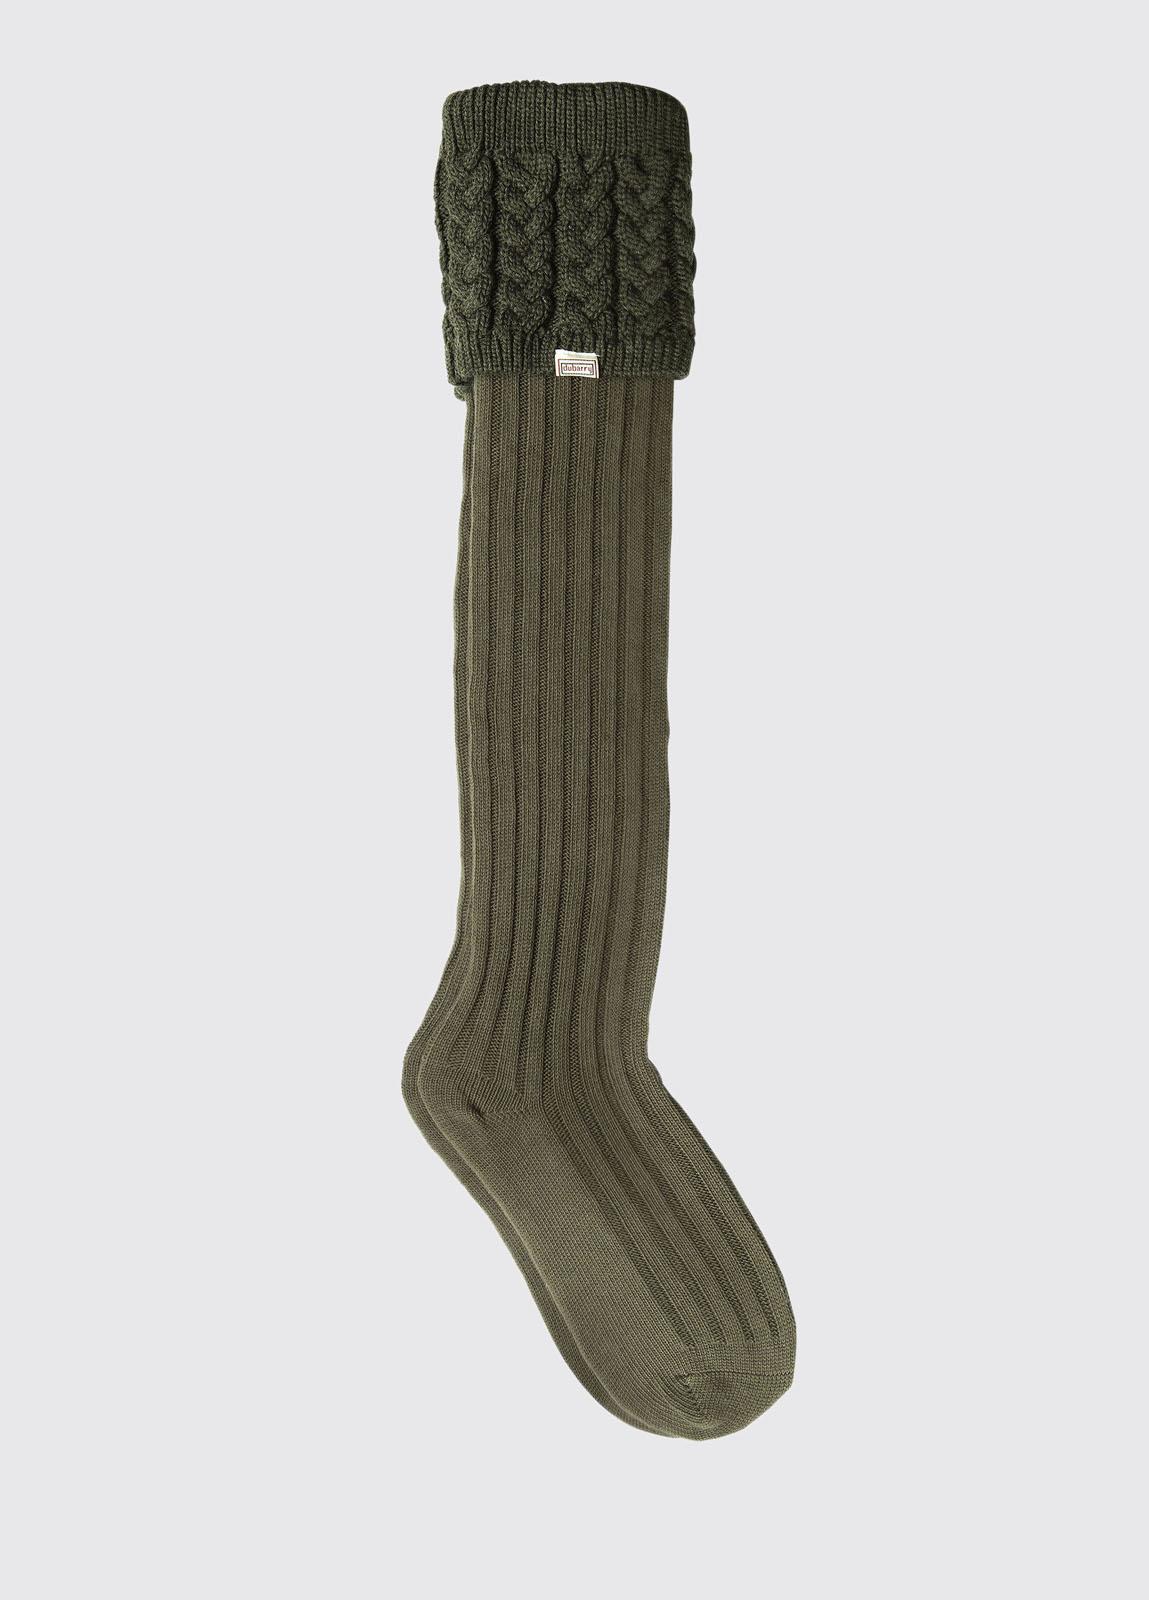 Trinity Socks - Olive